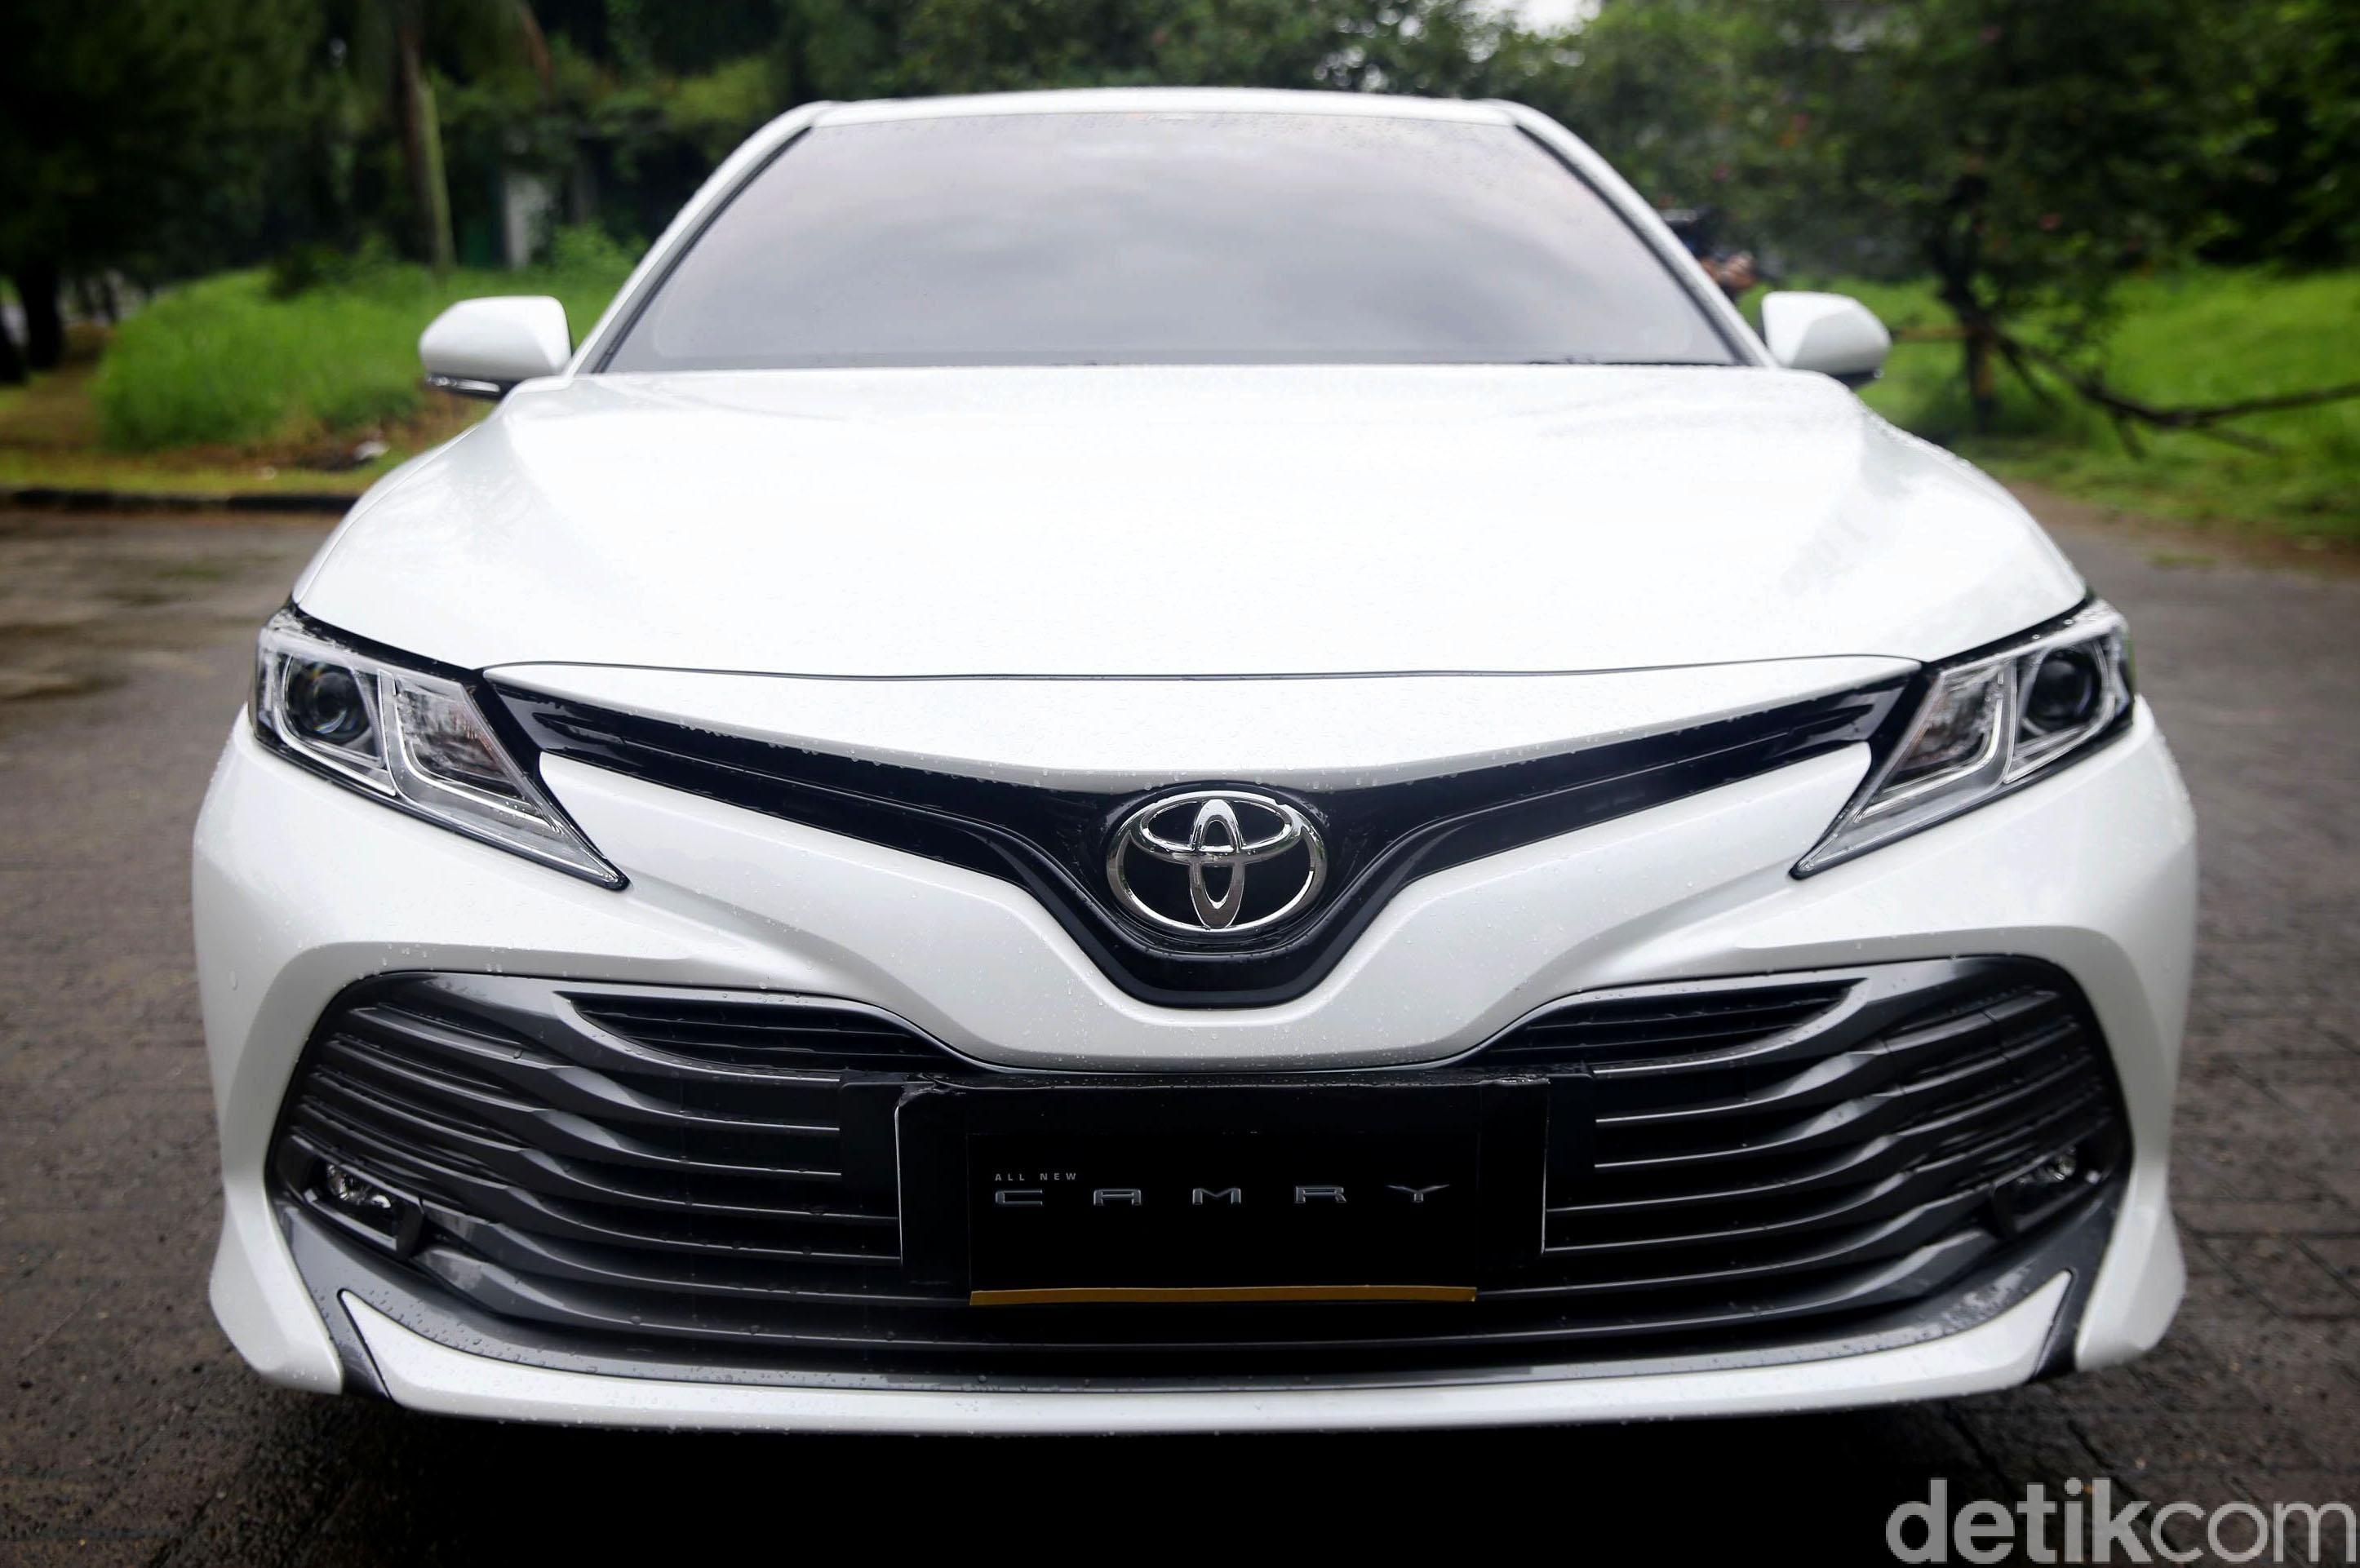 Penjualan Toyota Ketolong New Avanza Dan New Camry Toyota Bali Toyota Denpasar Promo Toyota Bali Toyota Land Cruiser Bali